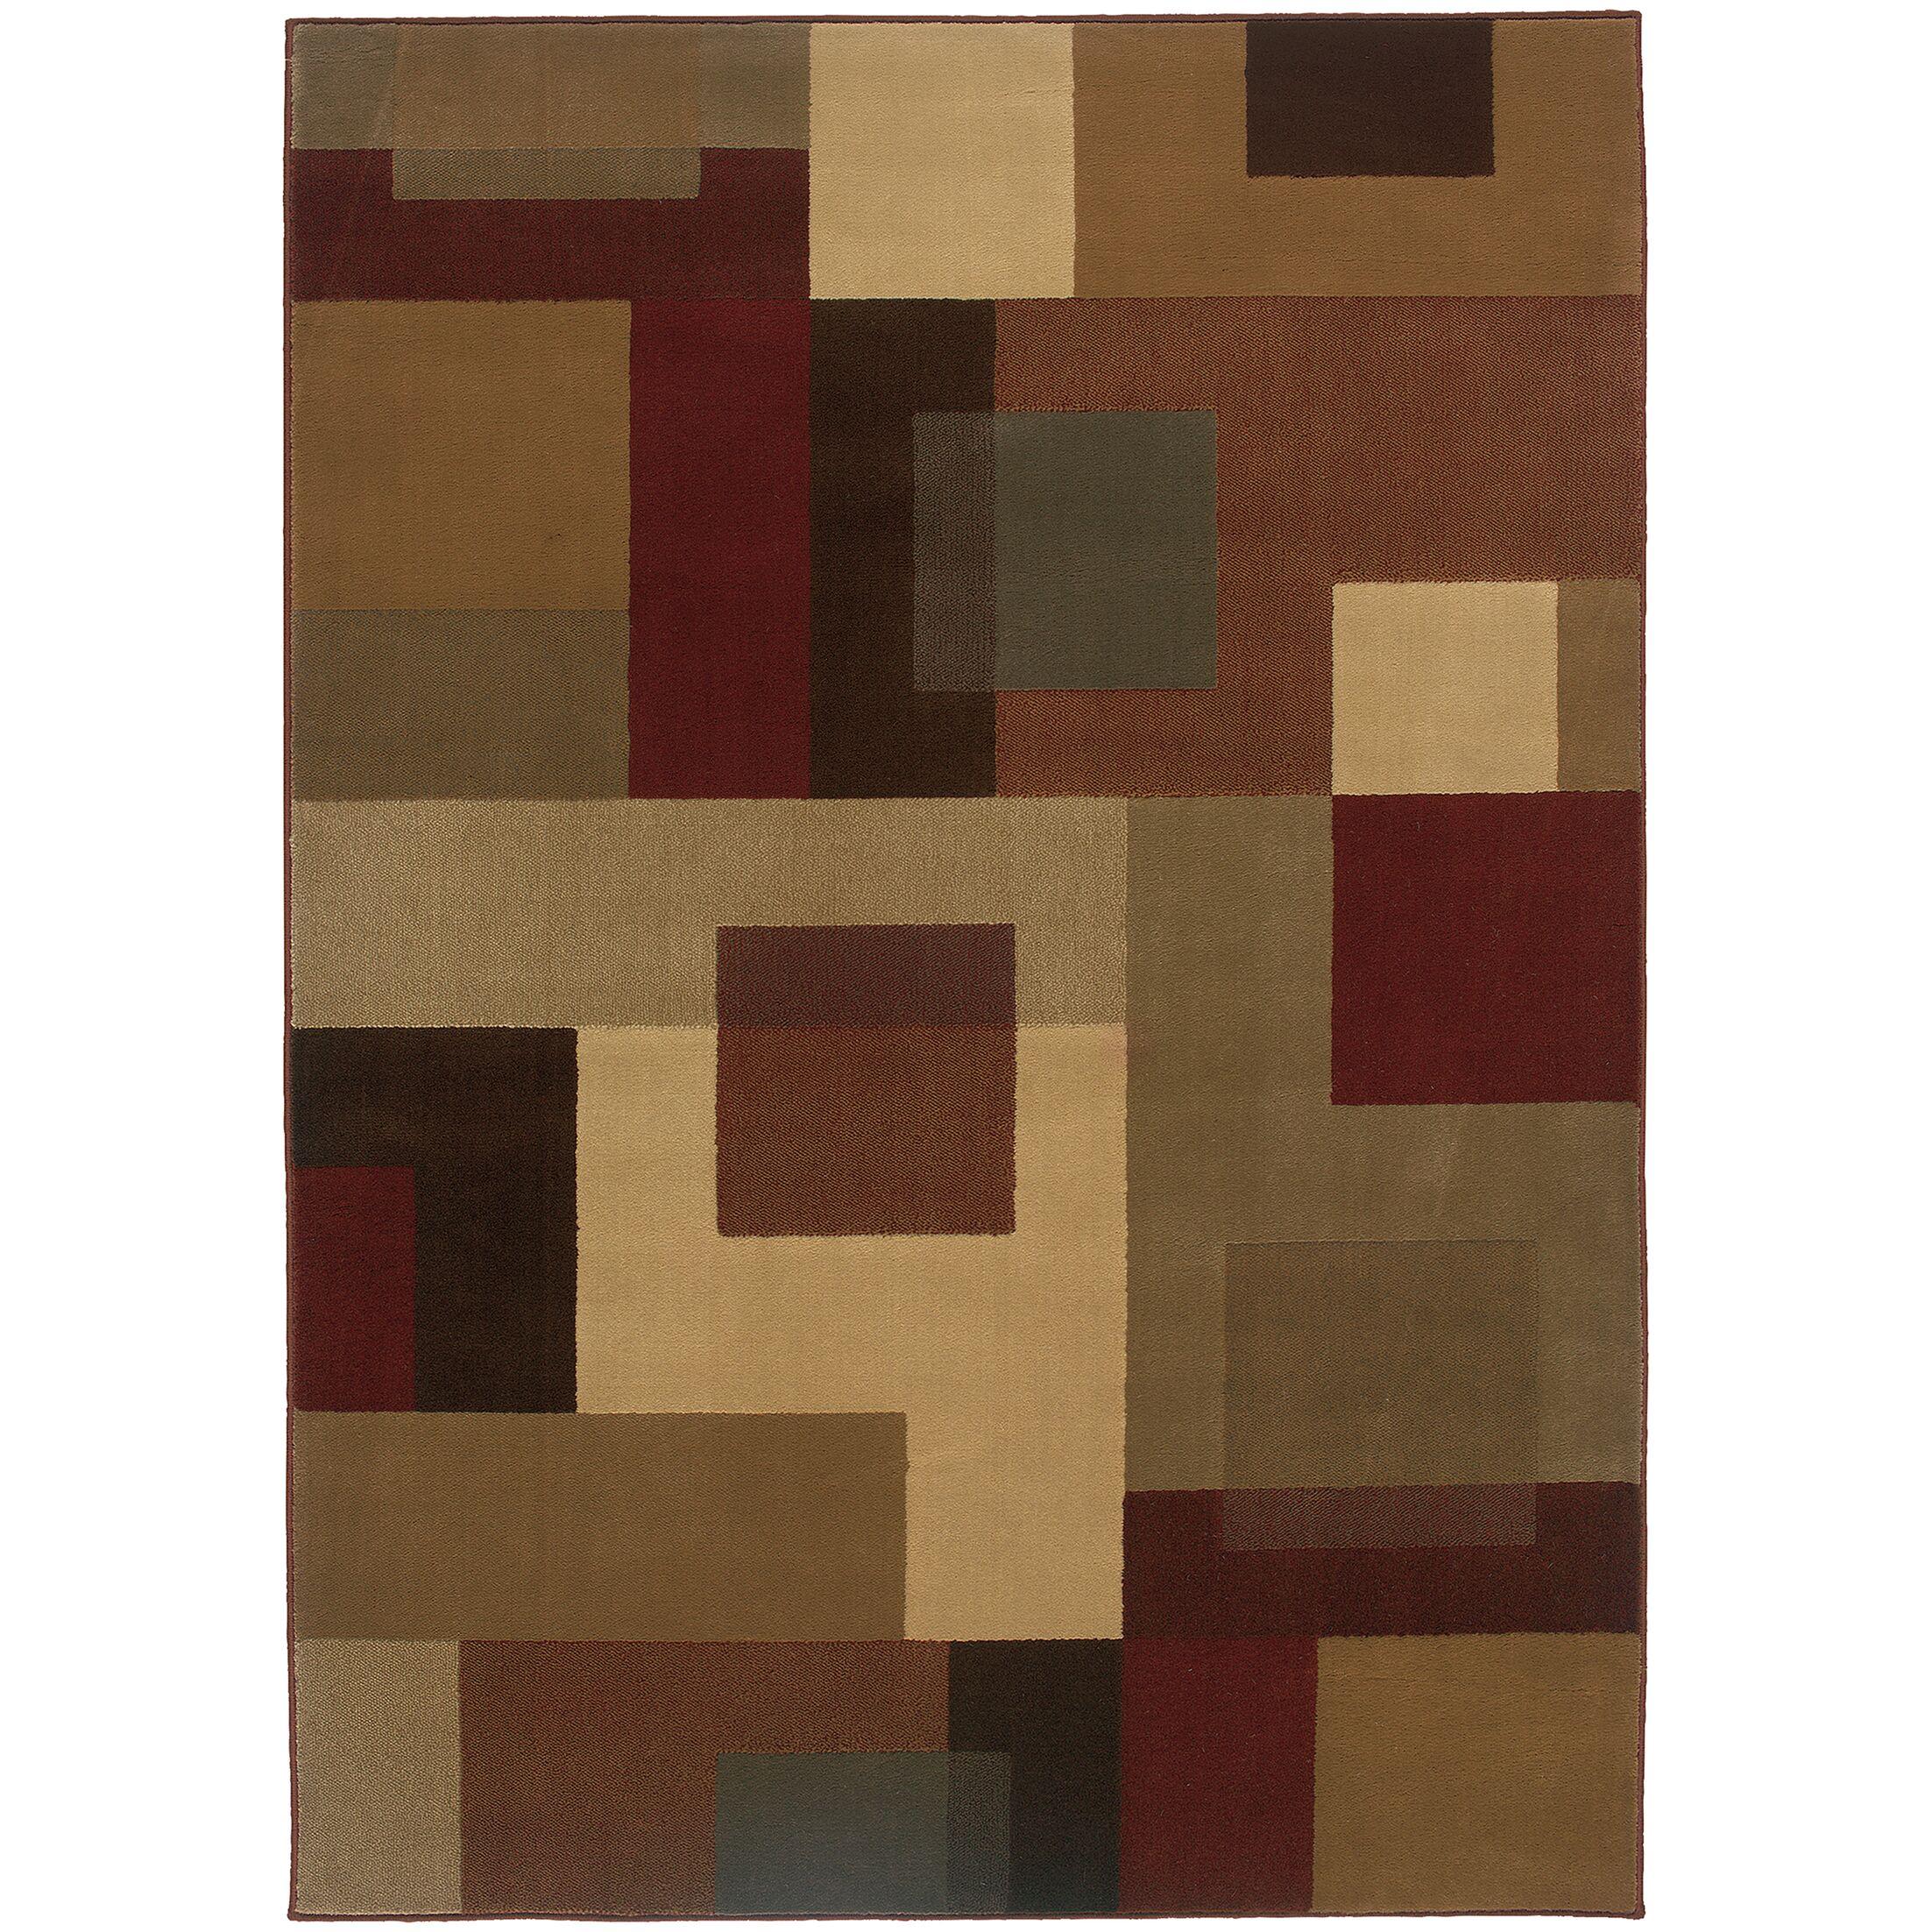 Garmon Red/Tan Area Rug Rug Size: Rectangle 5' x 7'6